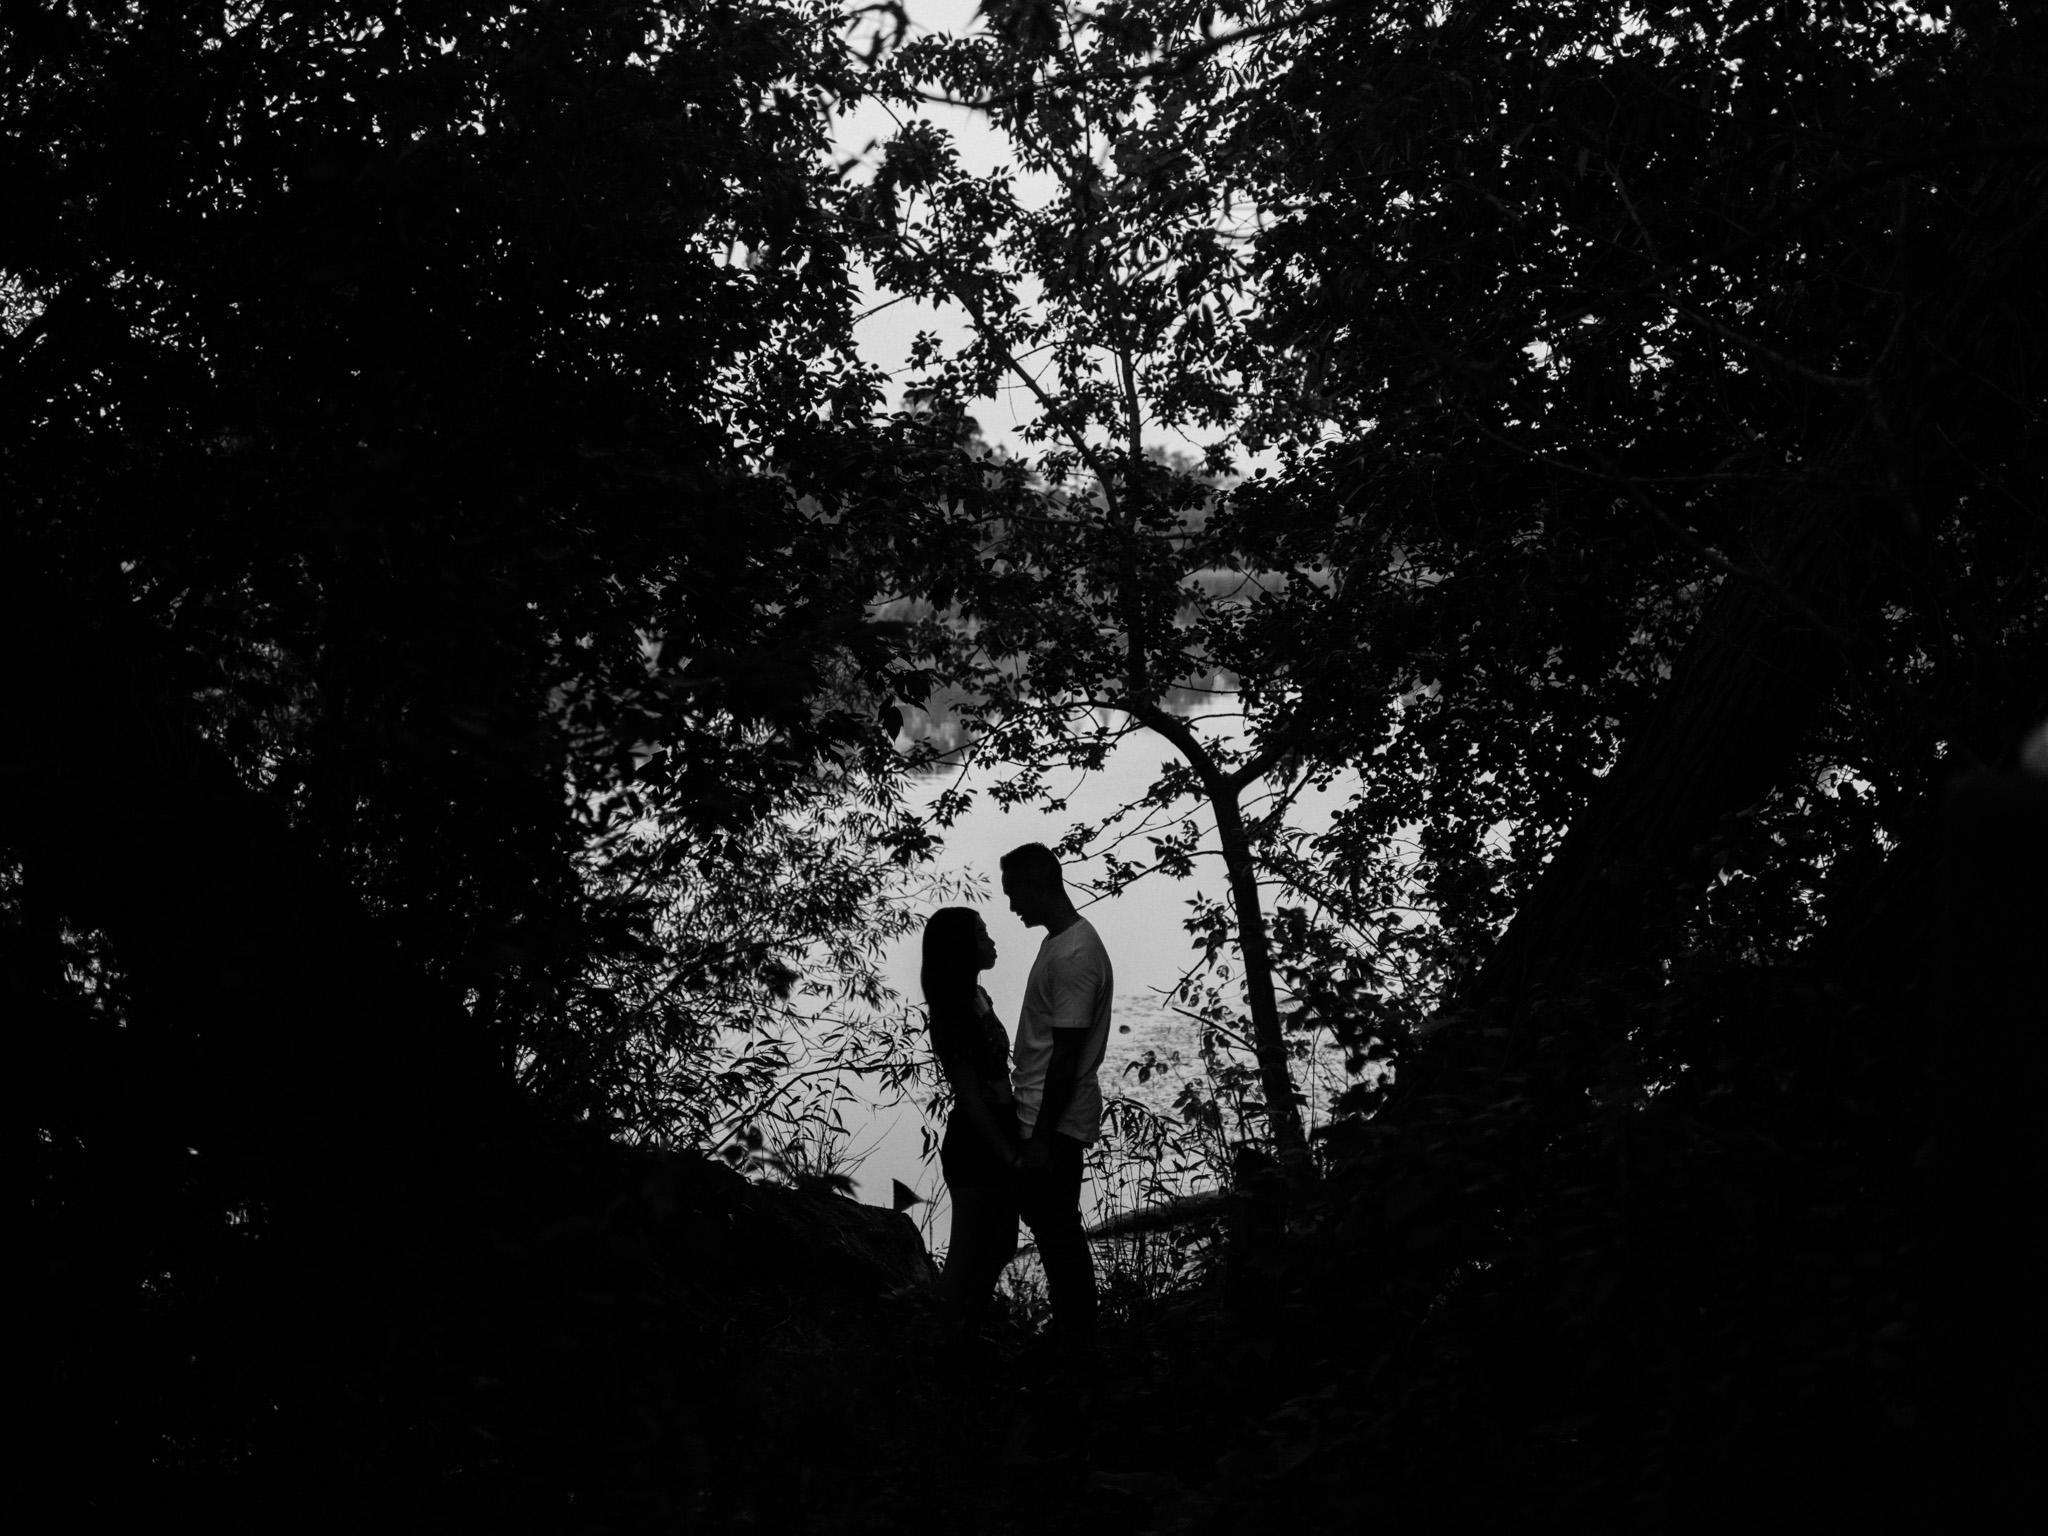 sunsetbeachengagement-torontoweddingphotographer-4.jpg